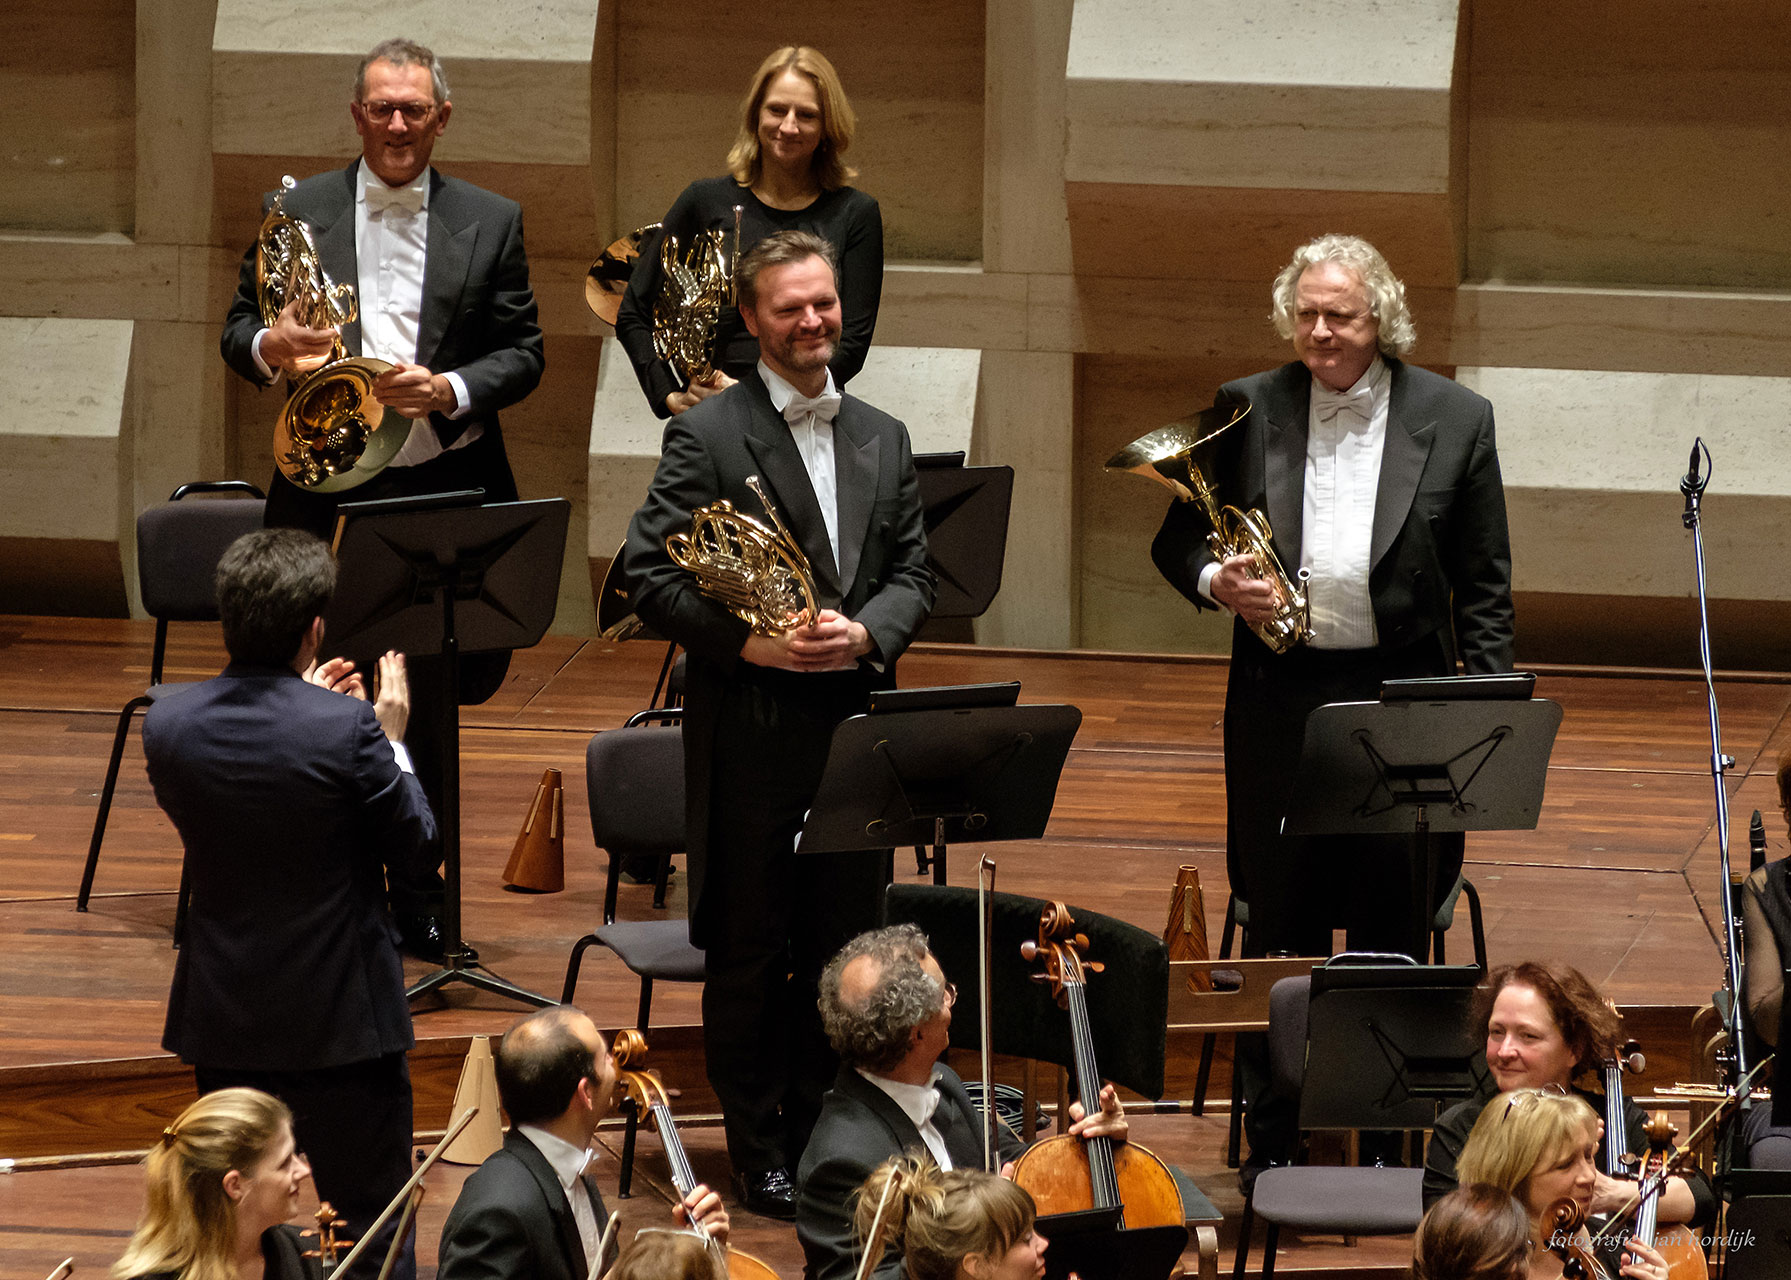 Rotterdam releases two veteran horns